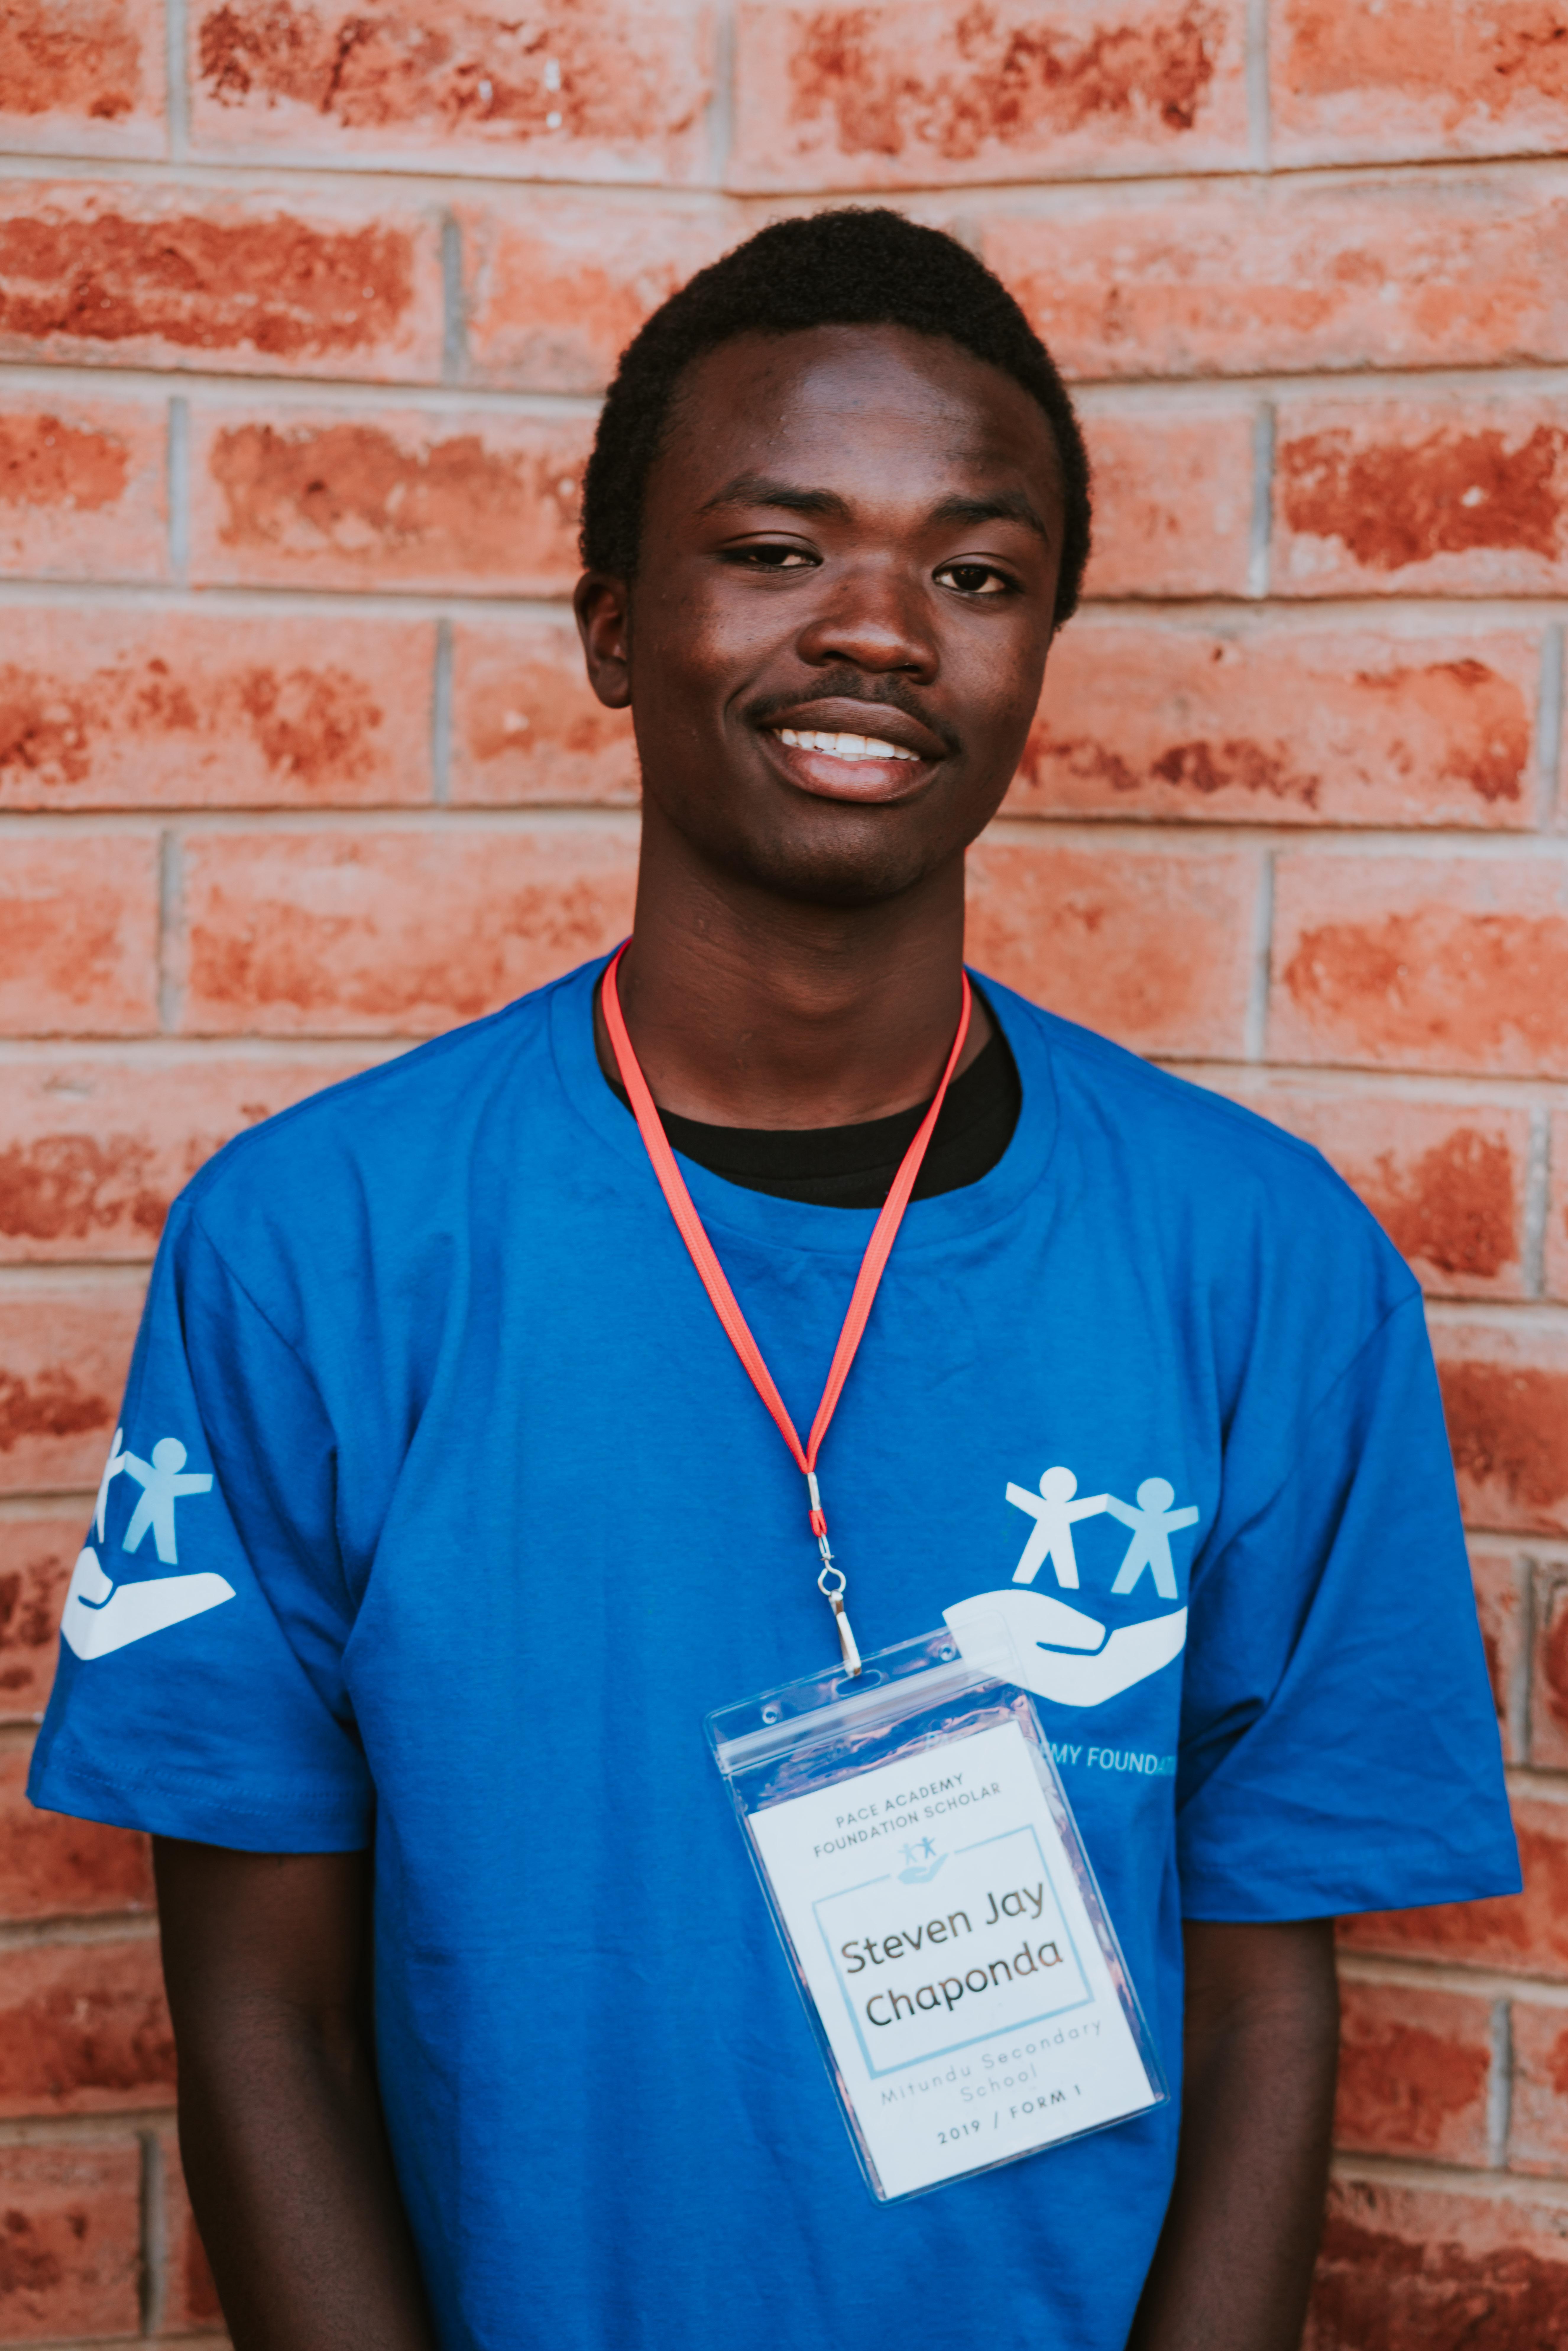 Steven Jay Chaponda (Mitundu Secondary S